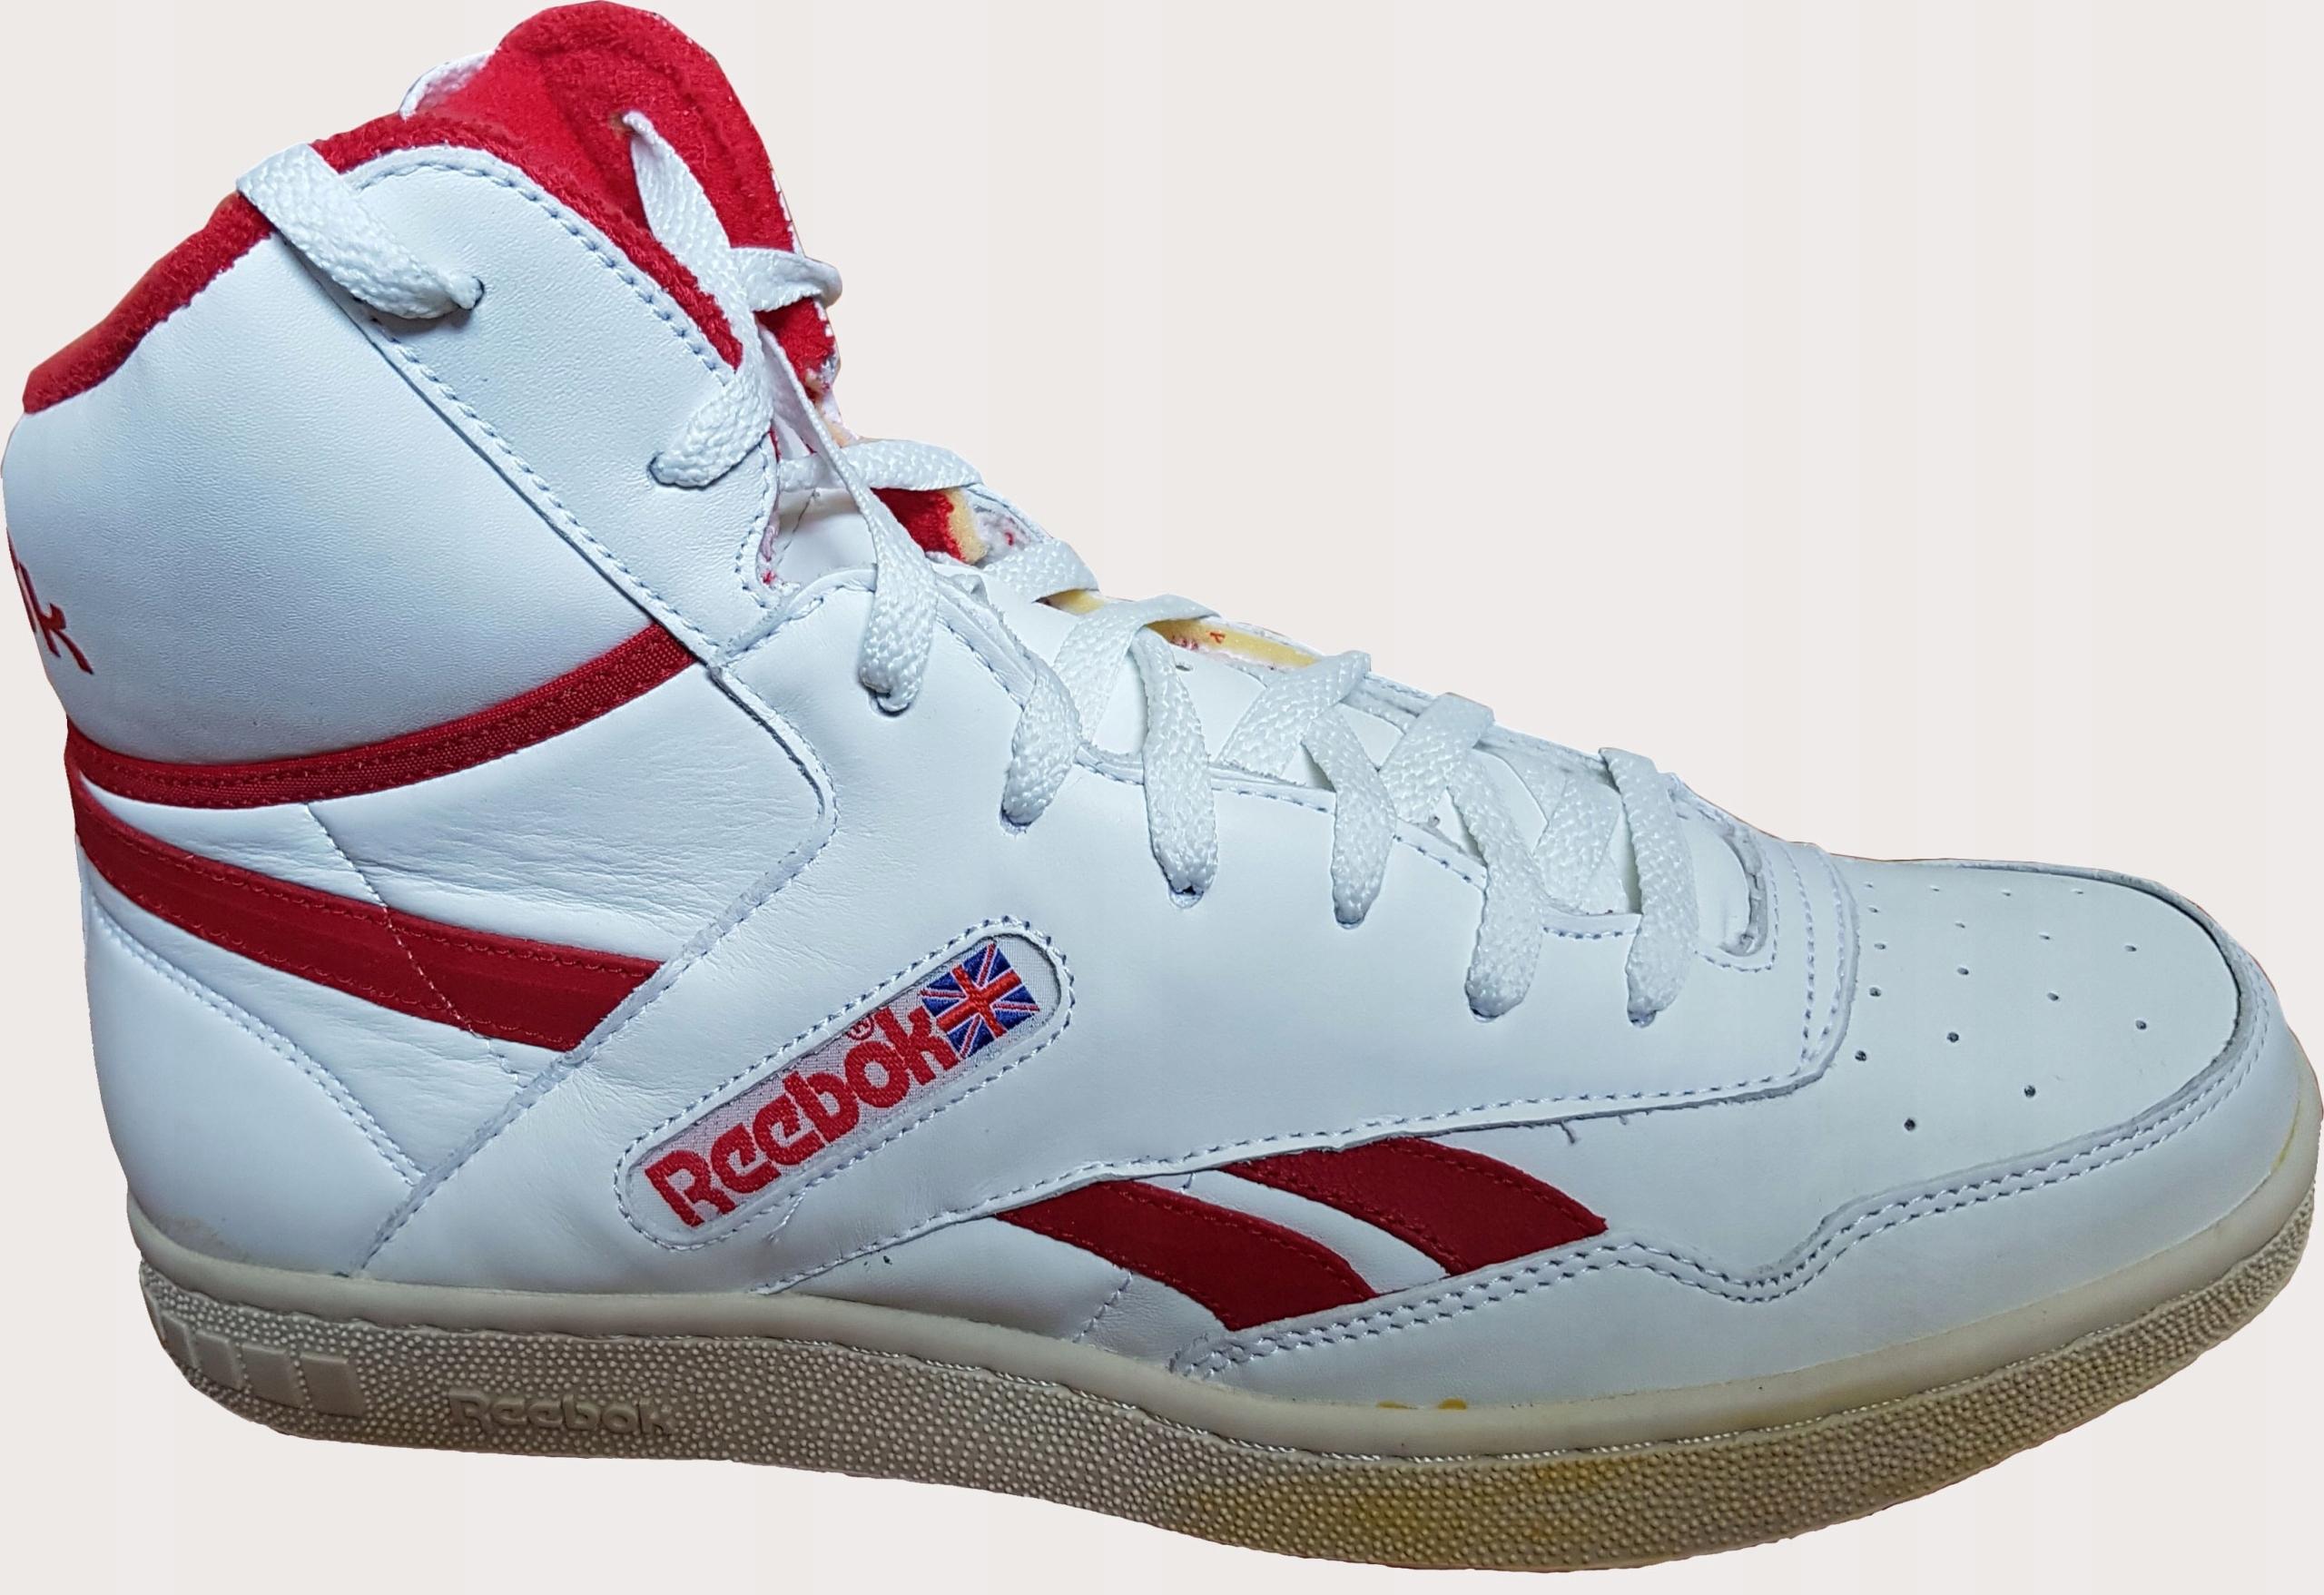 cc83e8e6 Adidas Classic 44 Reebok Snakersy Buty 7520395740 R Puma Nike Yvfybg76